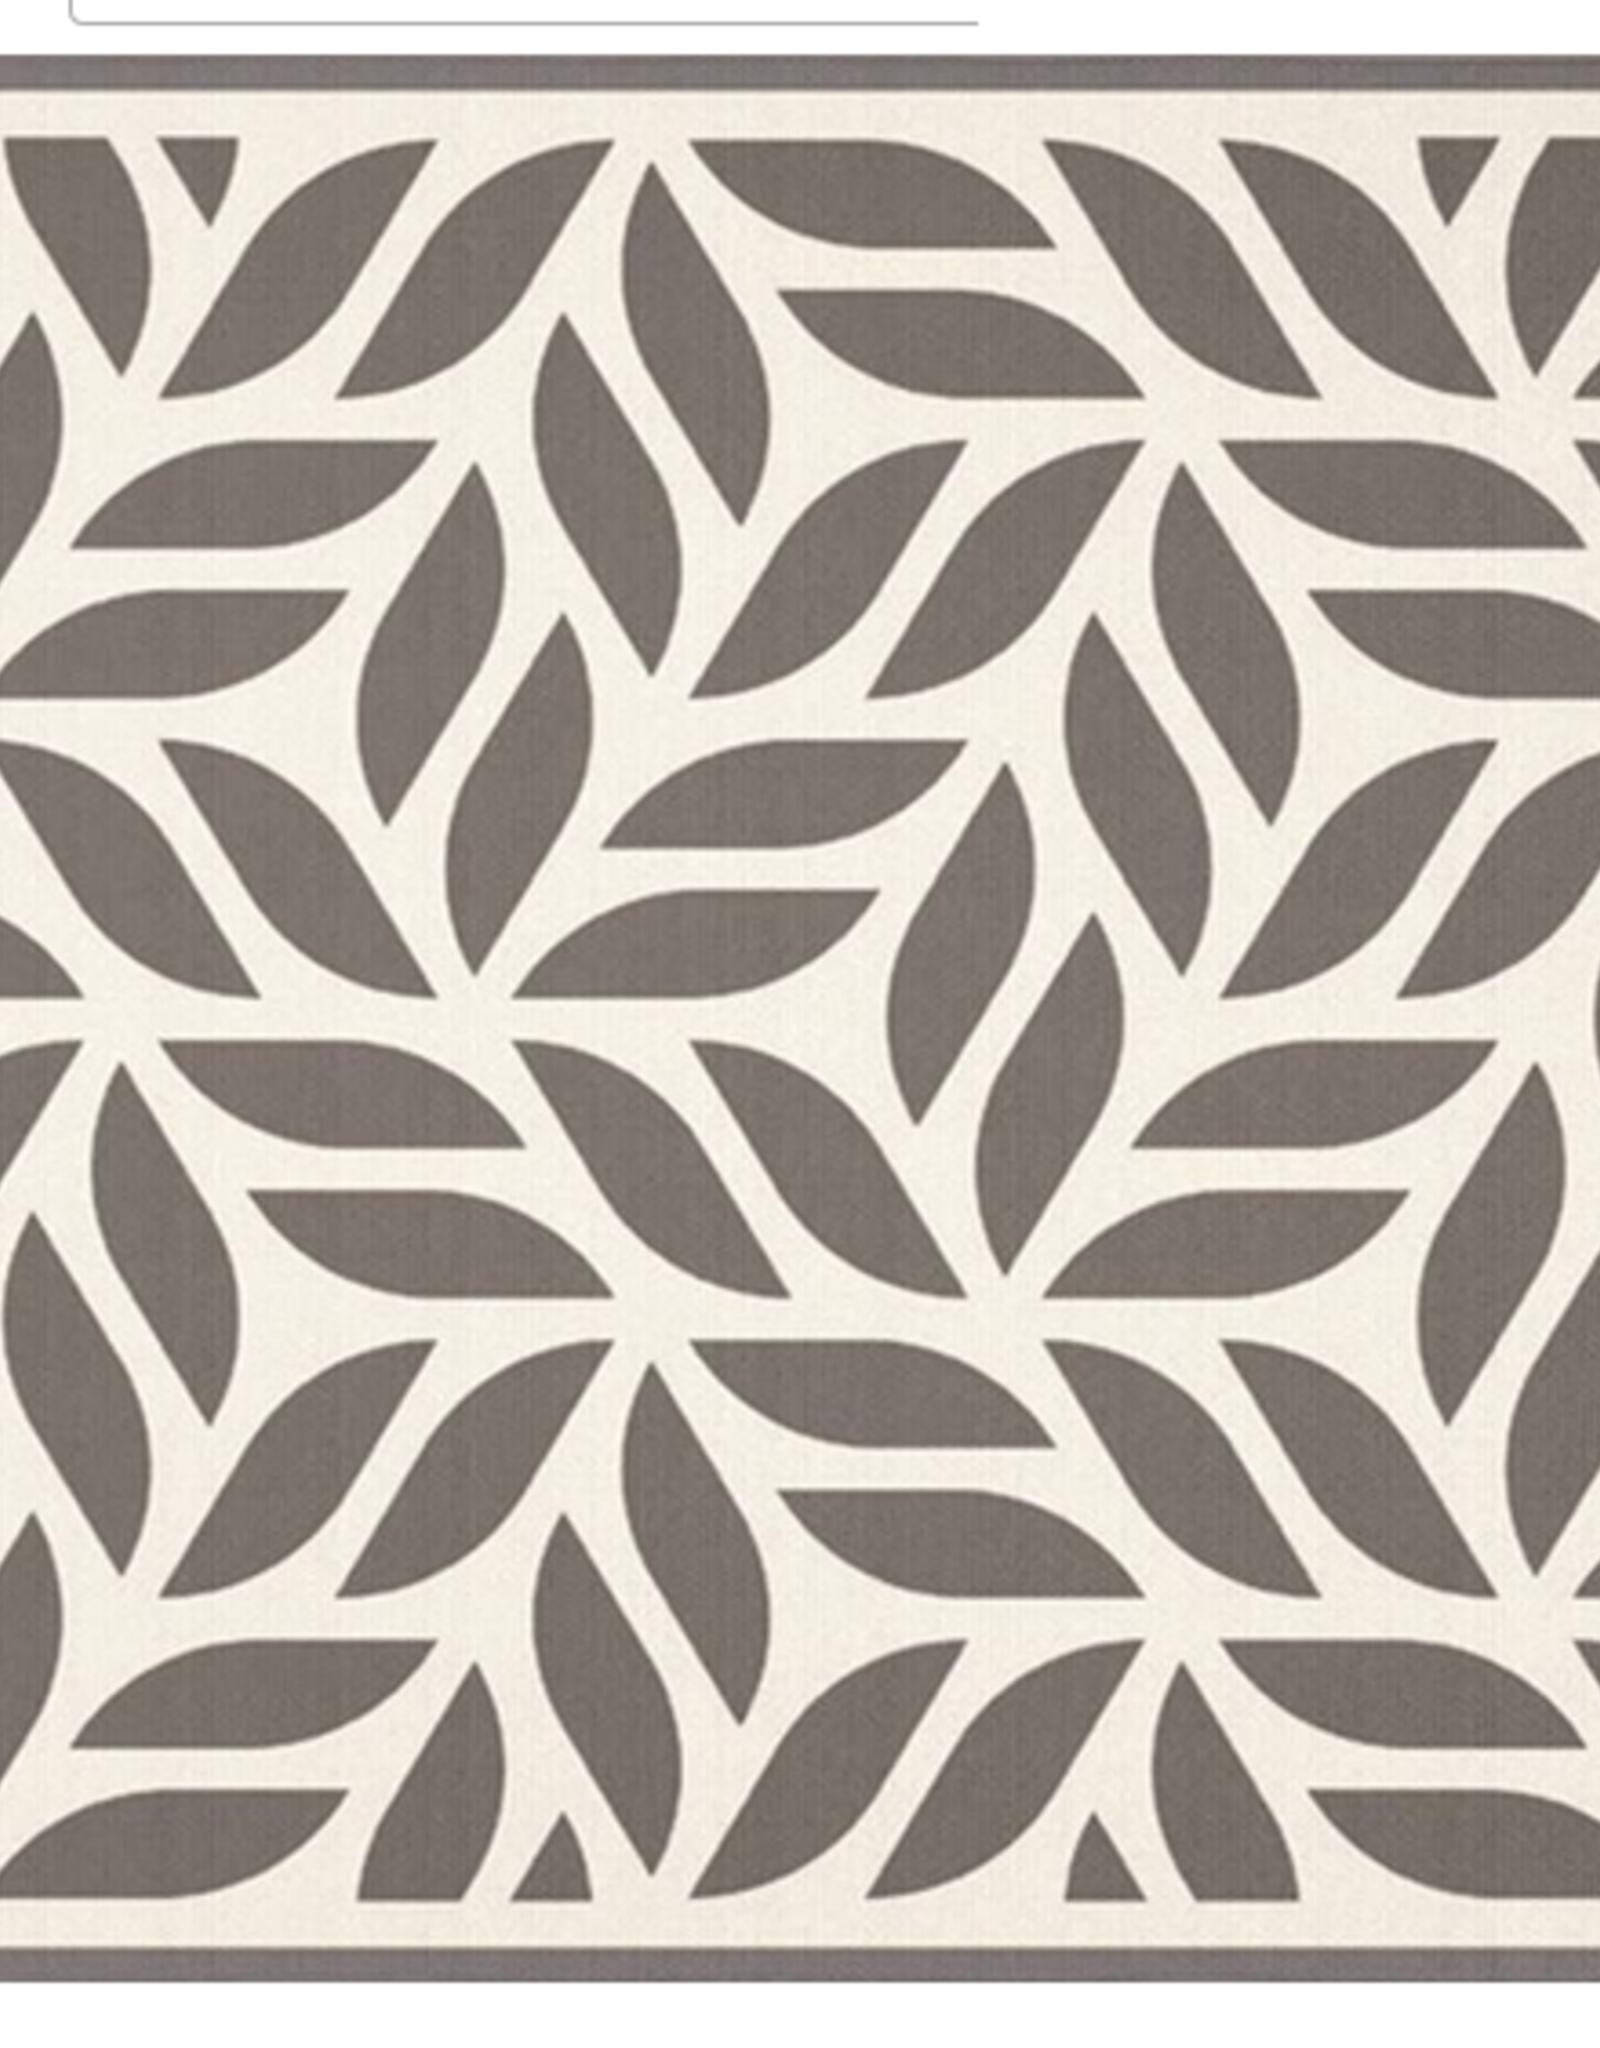 Soft Woven Floor Decor 2' x 3' soft woven rug